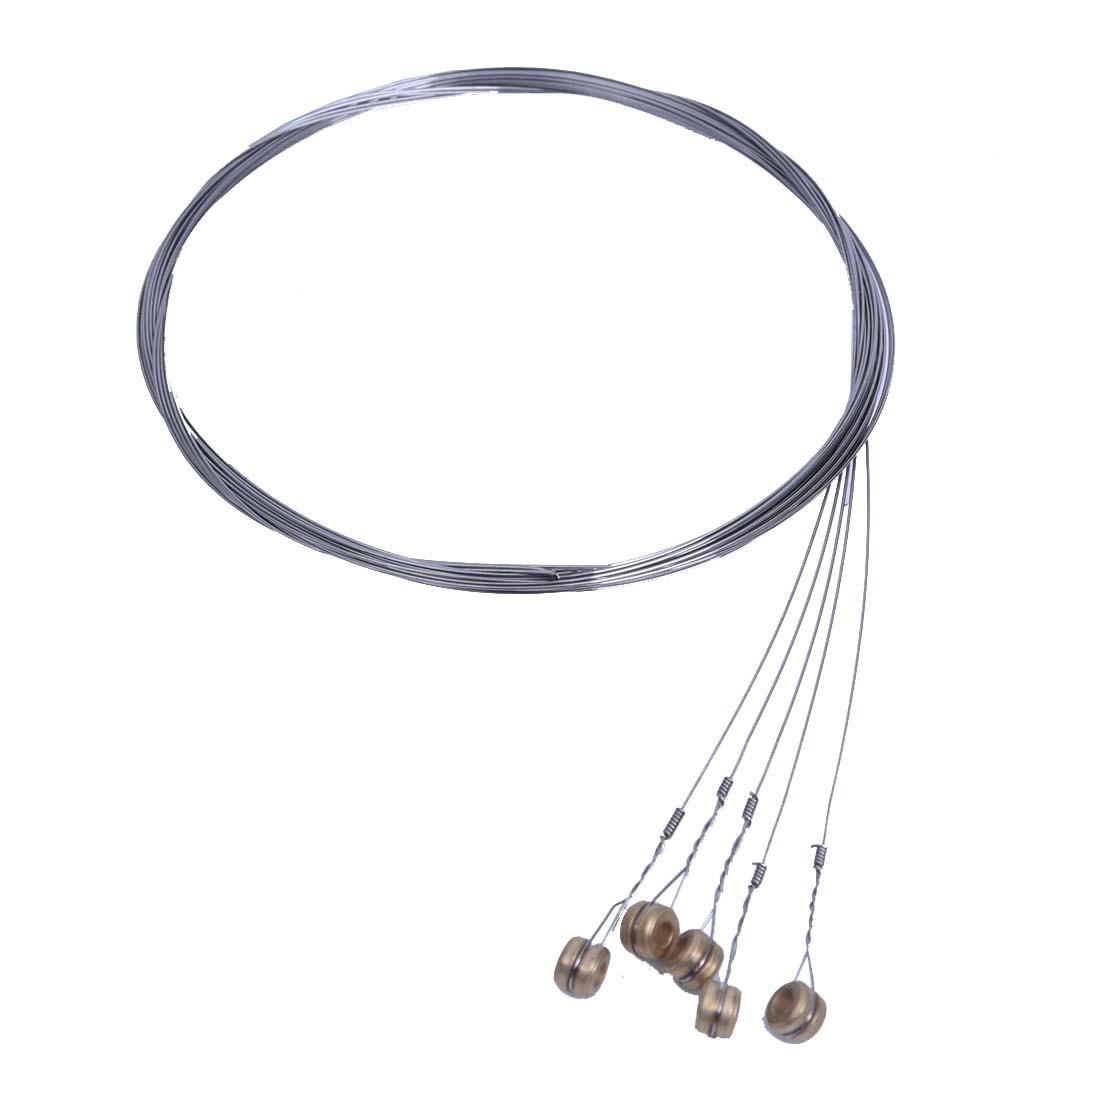 Ibanez 9 String